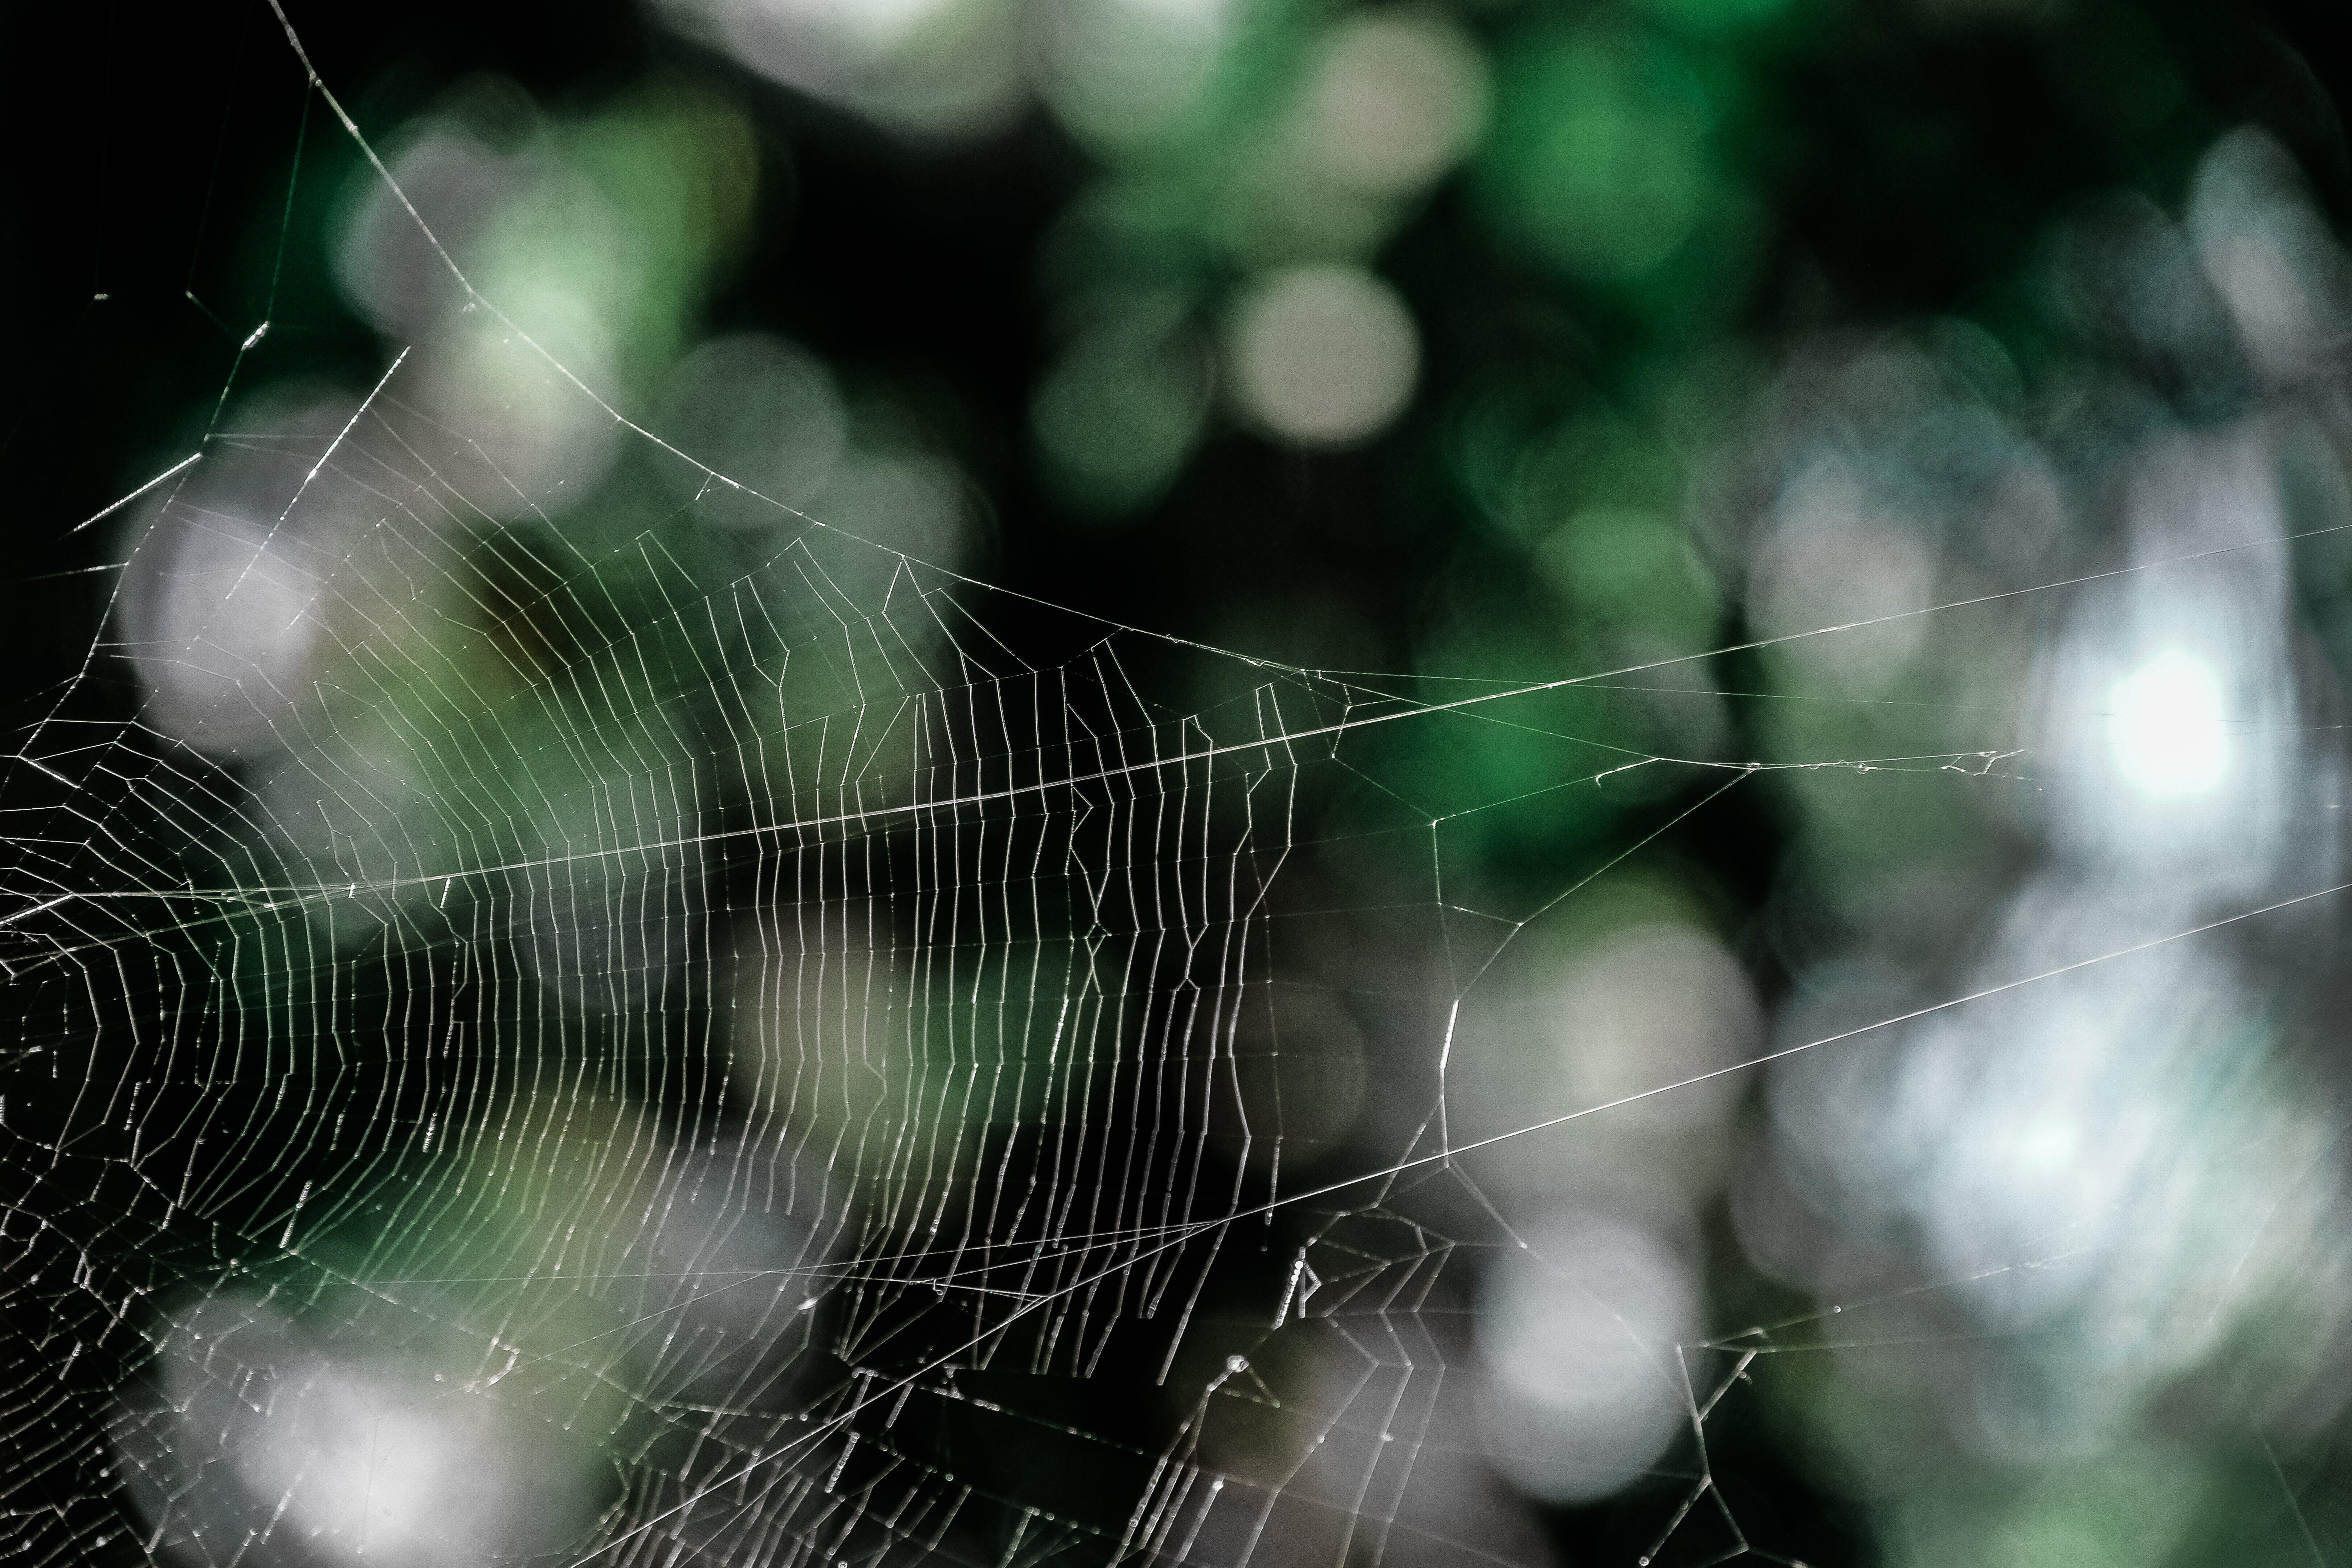 Kostenloses Stock Foto zu makro, muster, netz, spinnennetz